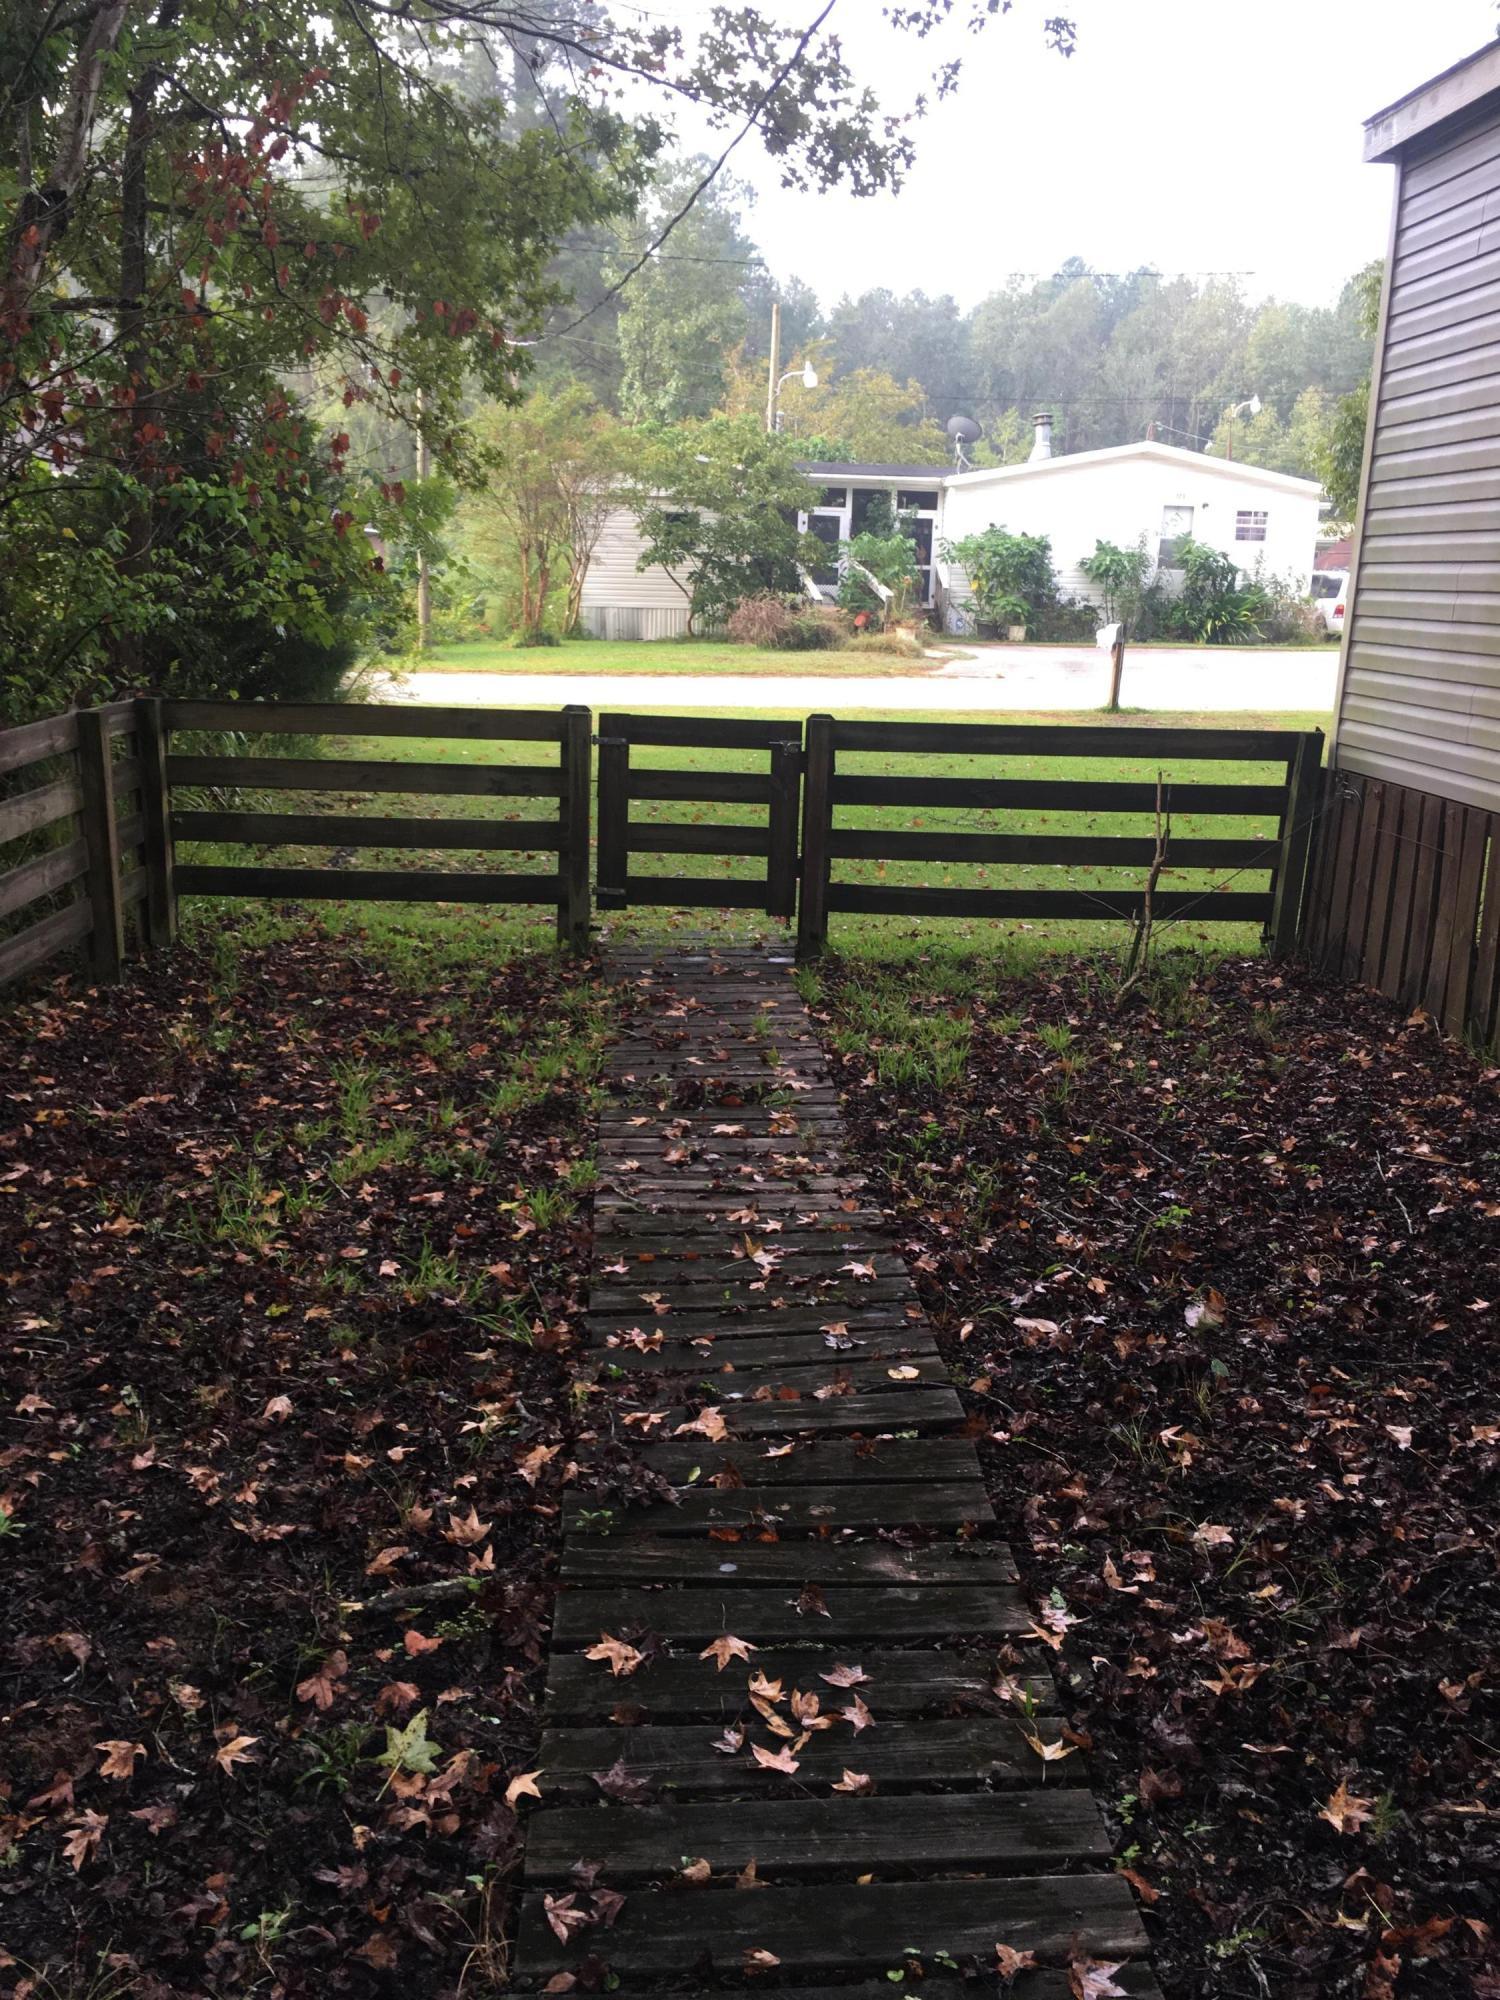 Green Acres Homes For Sale - 127 Still, Walterboro, SC - 4